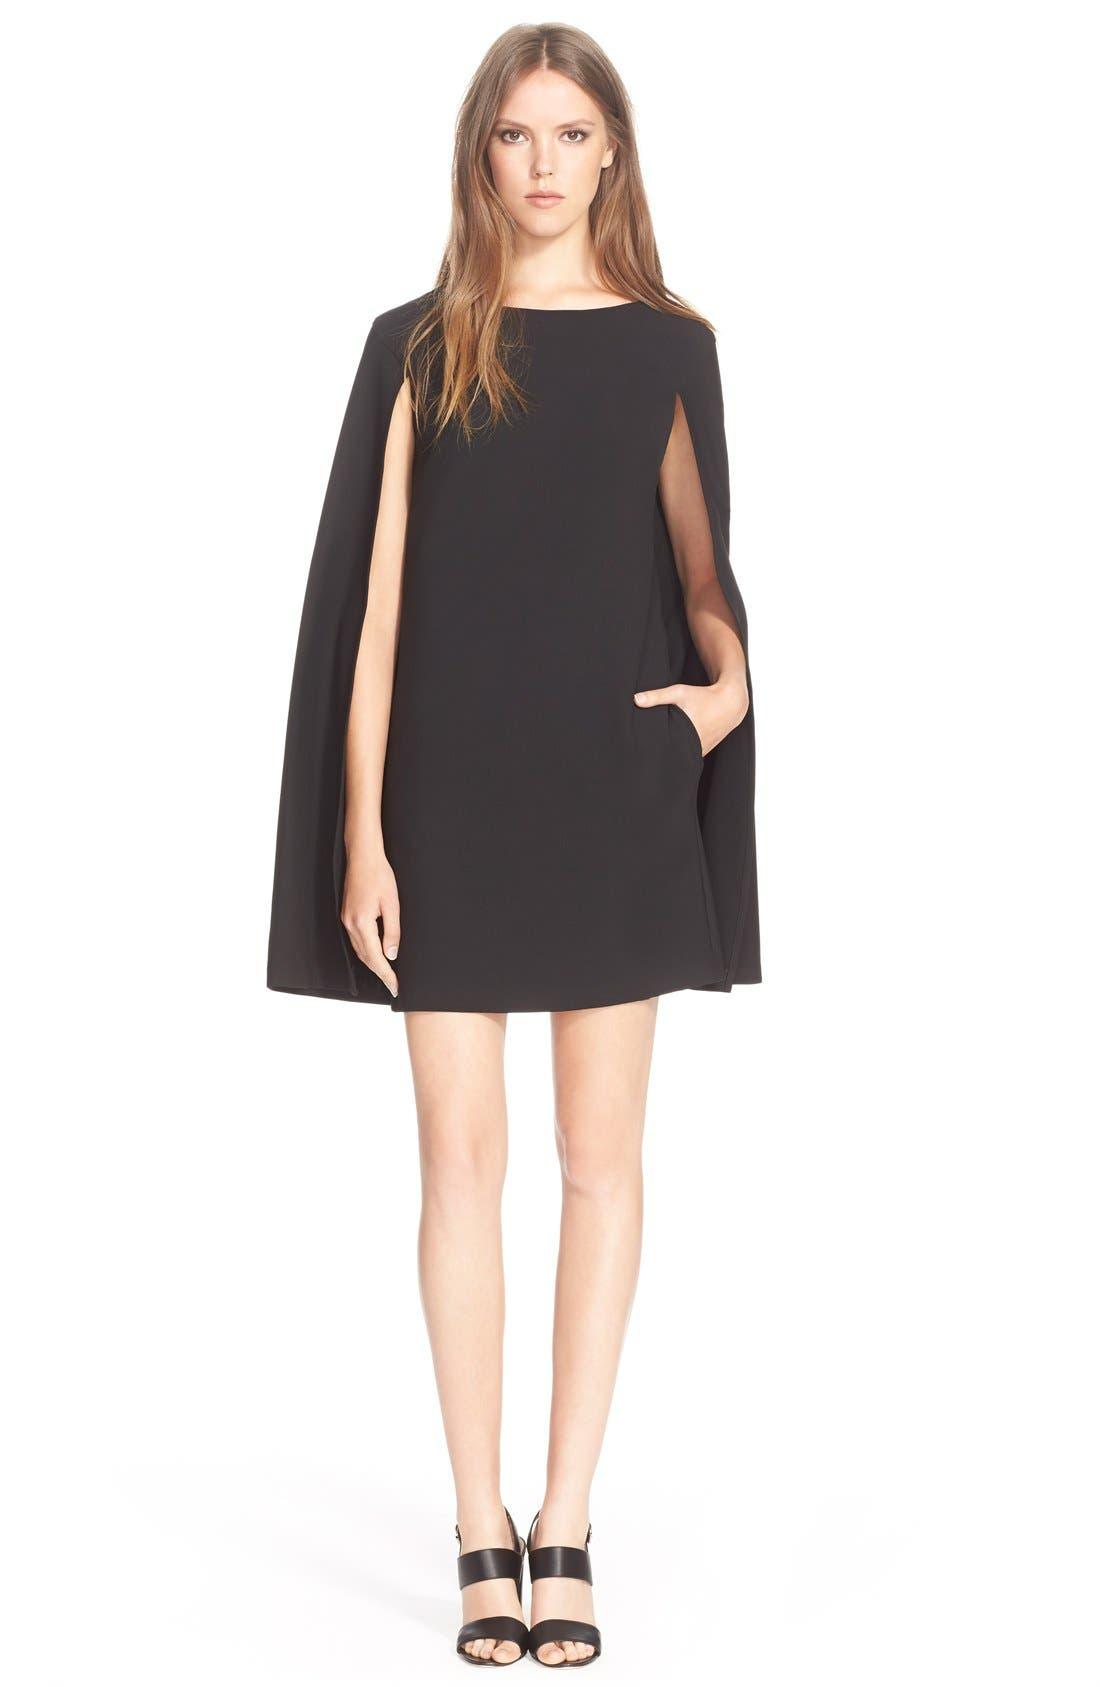 Alternate Image 1 Selected - TrinaTurk'Gizela'Cape Back Dress